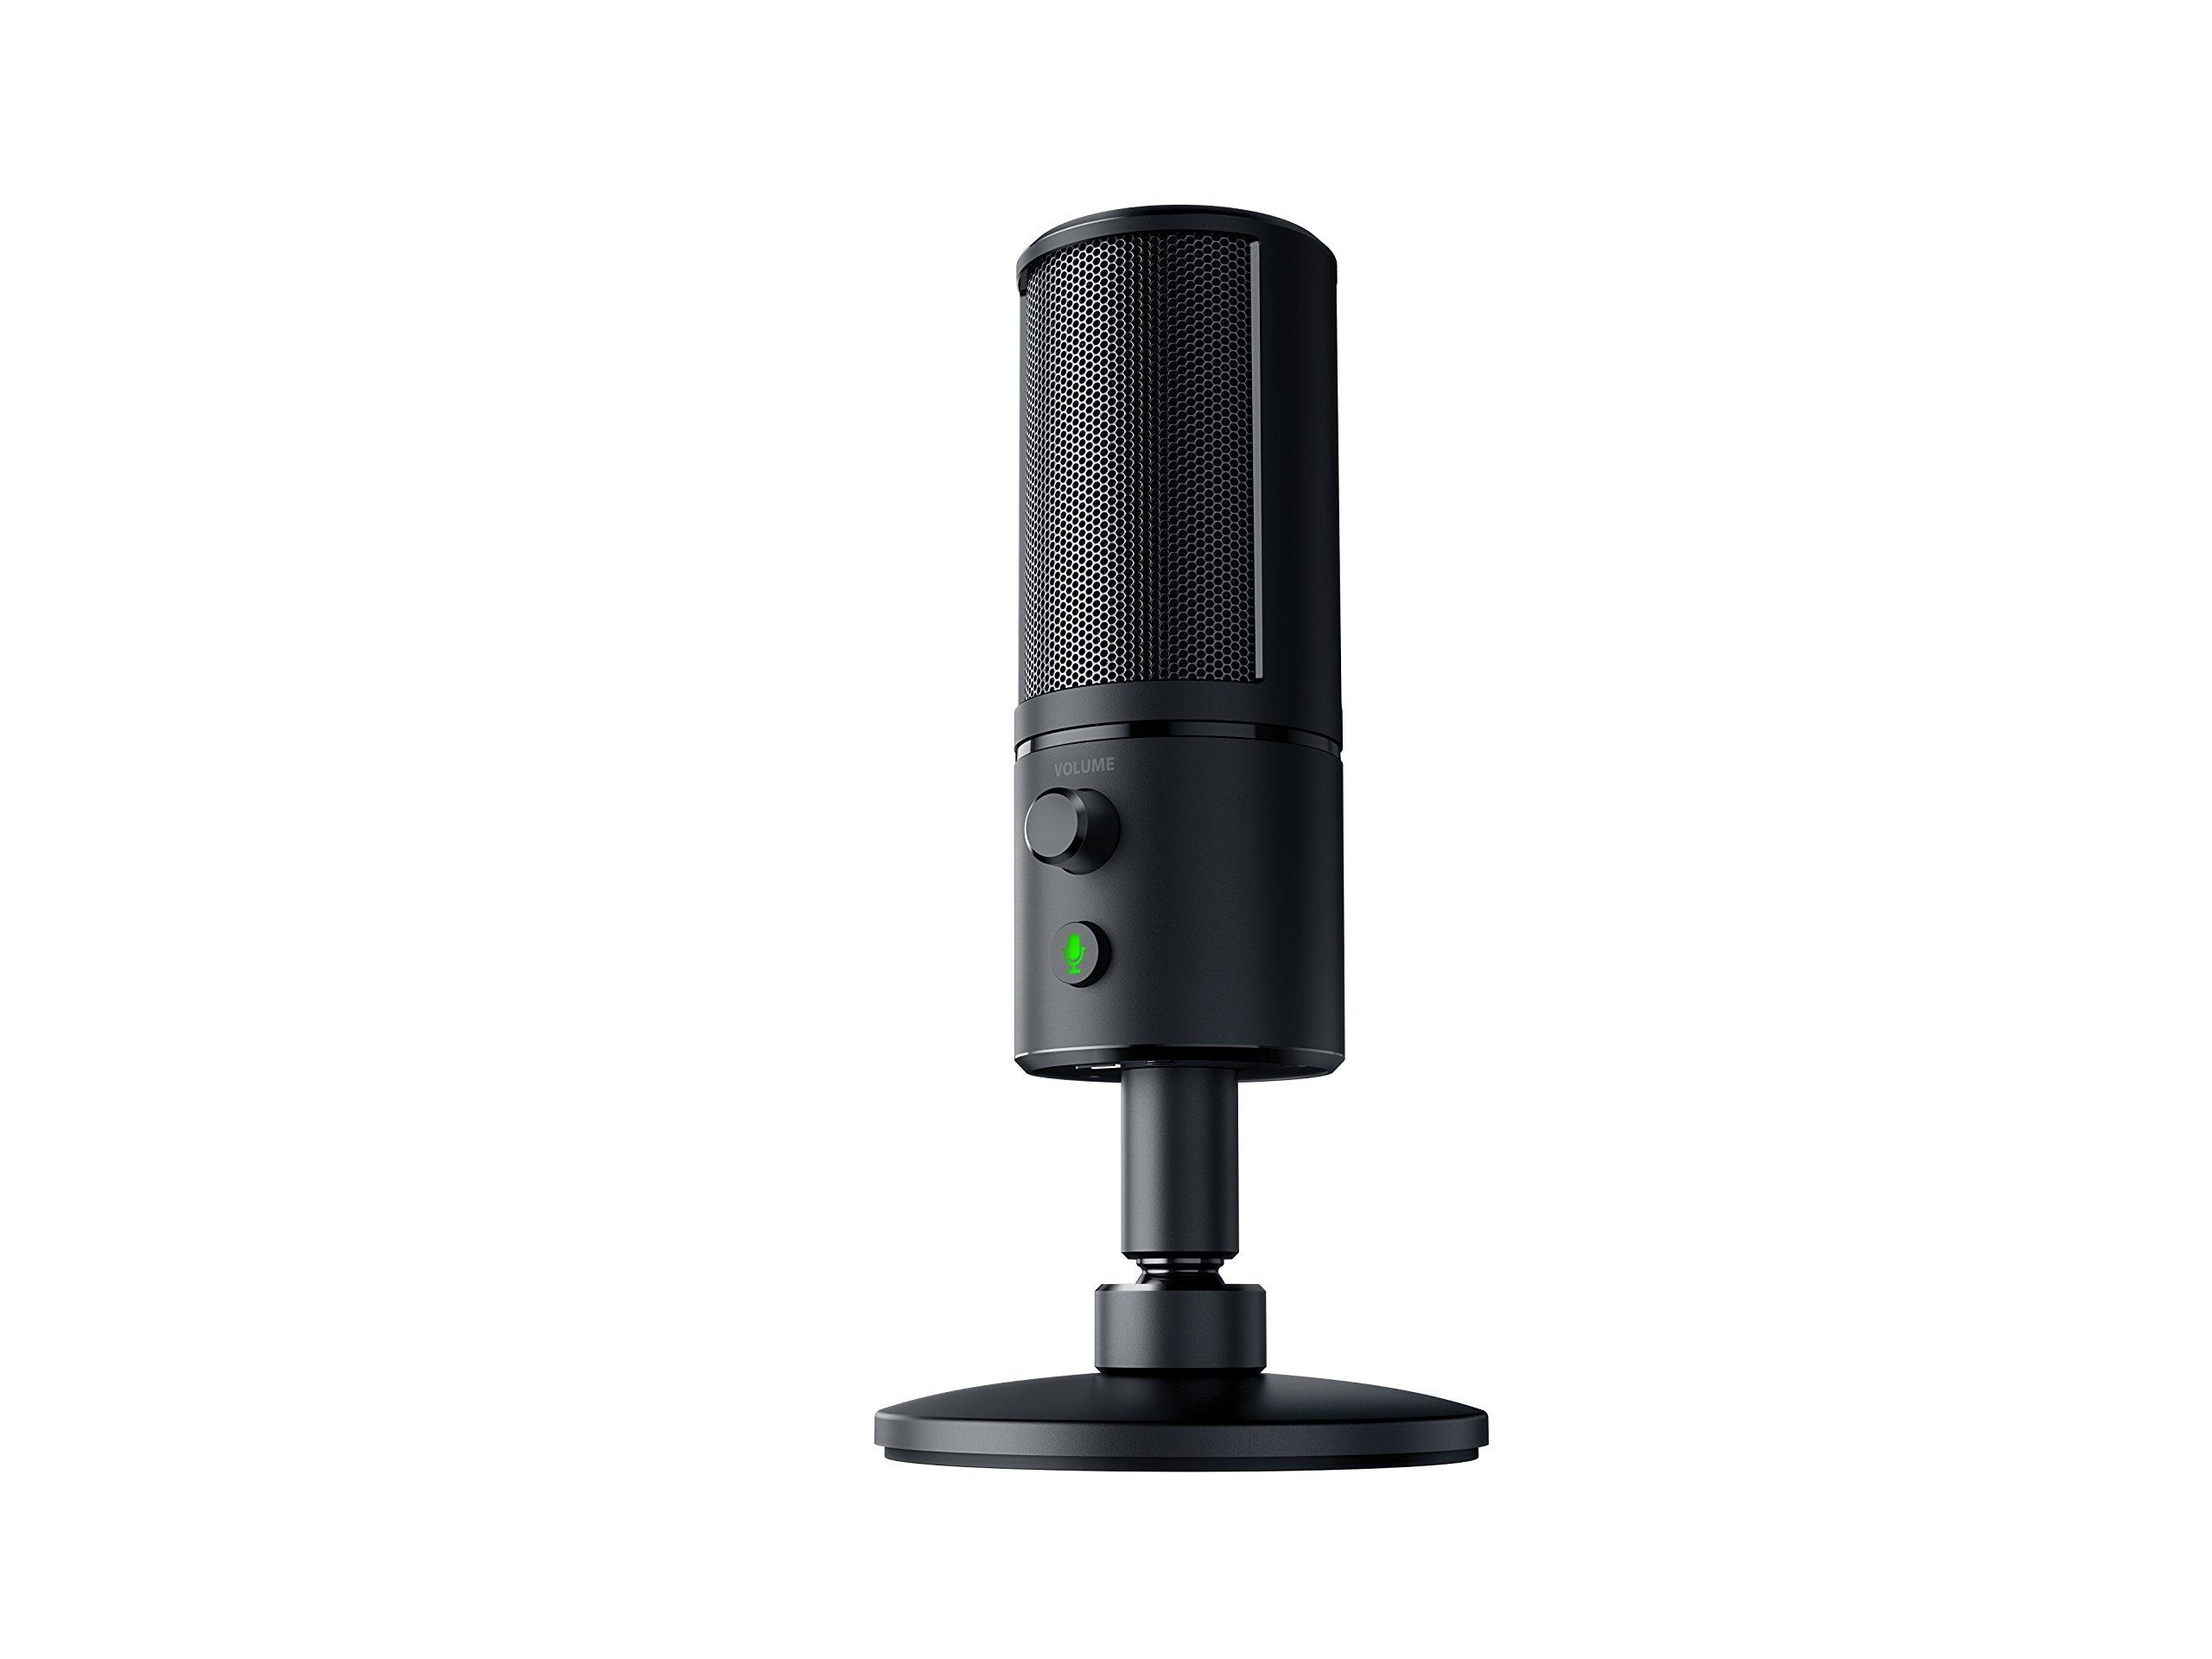 Razer Seiren X USB Streaming Microphone: Professional Grade - Built-In Shock Mount - Supercardiod Pick-Up Pattern - Anodized Aluminum - Matte Black by Razer